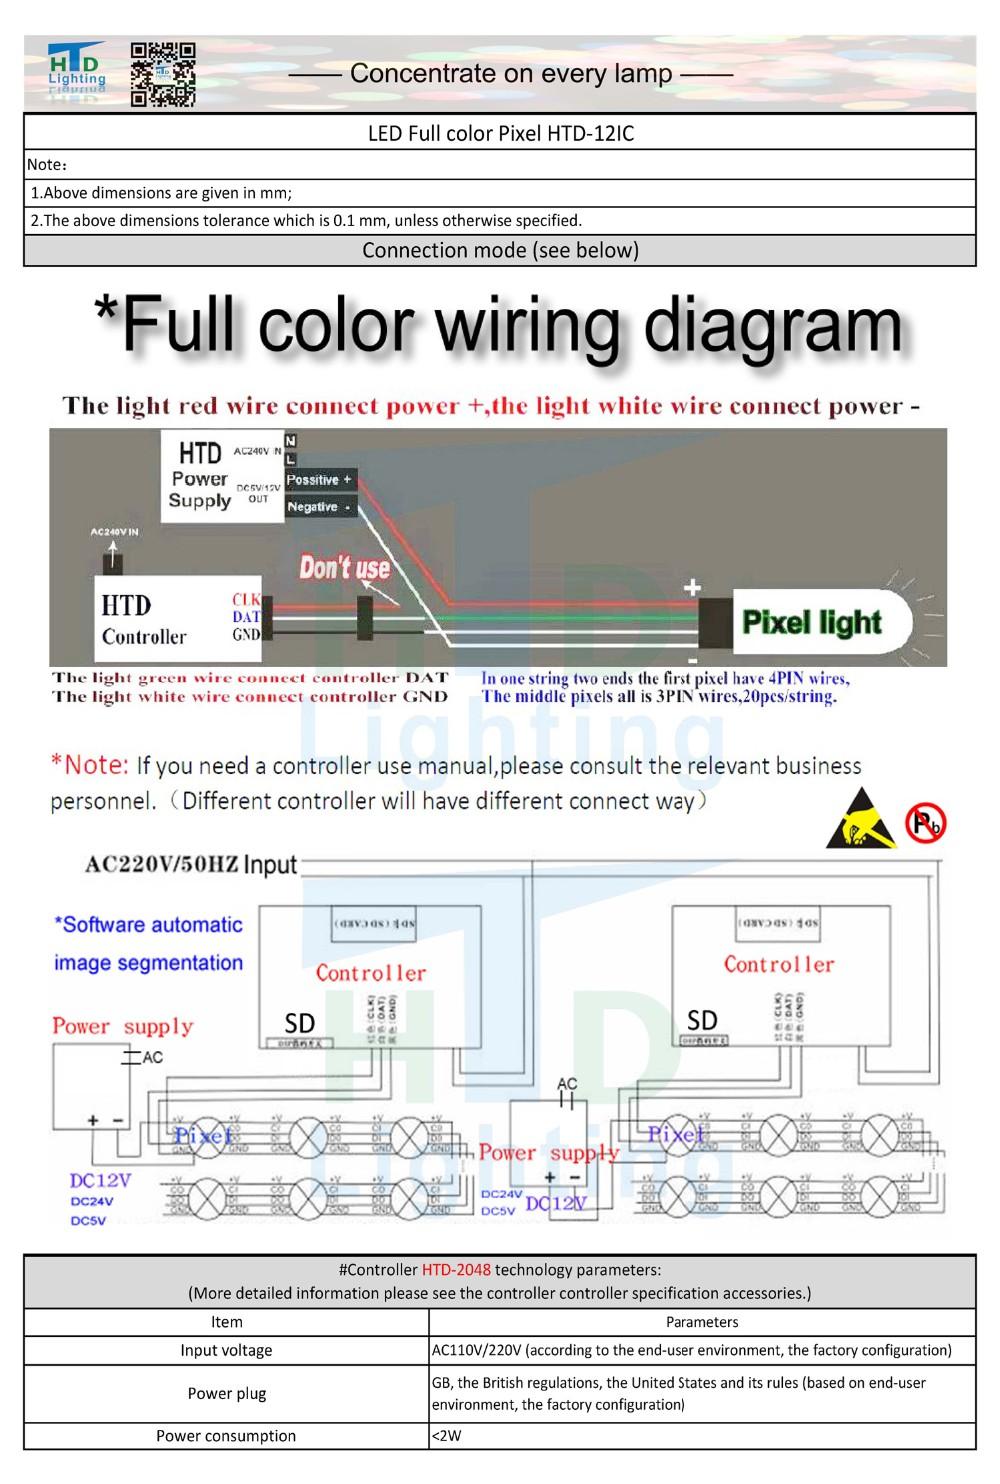 HTD-12IC LED Full color pixel-SPEC 201605__2